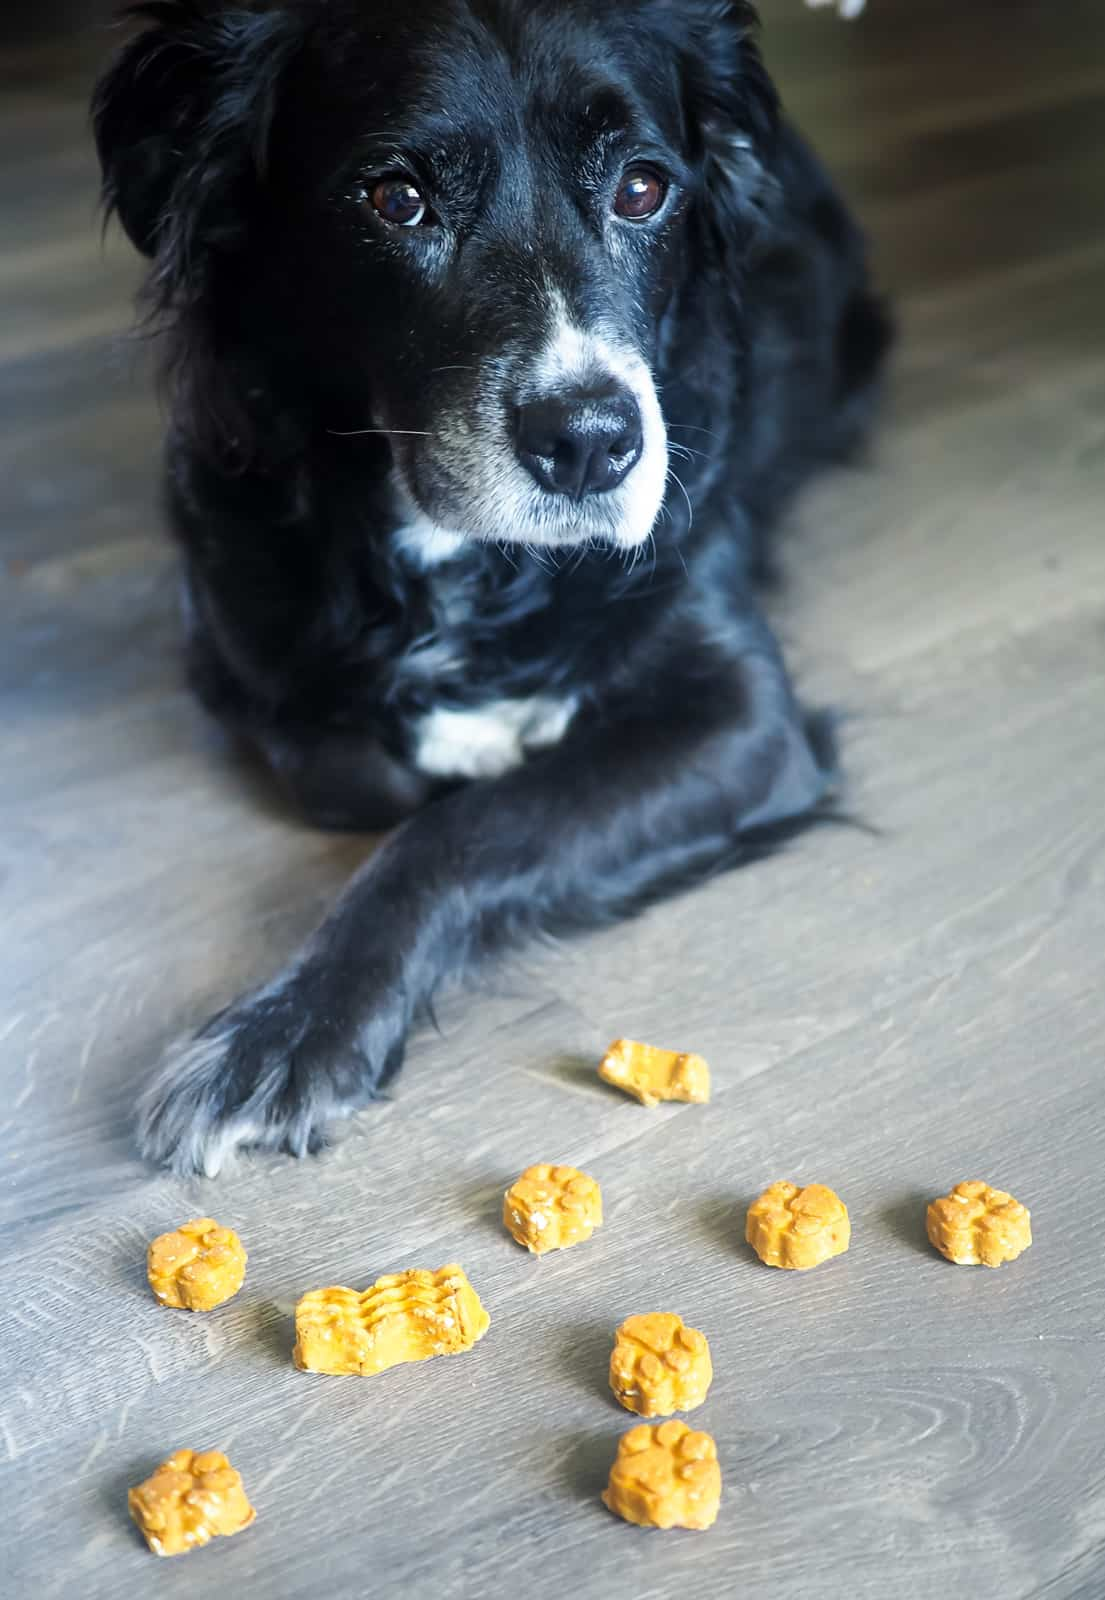 a black dog laying near some dog treats